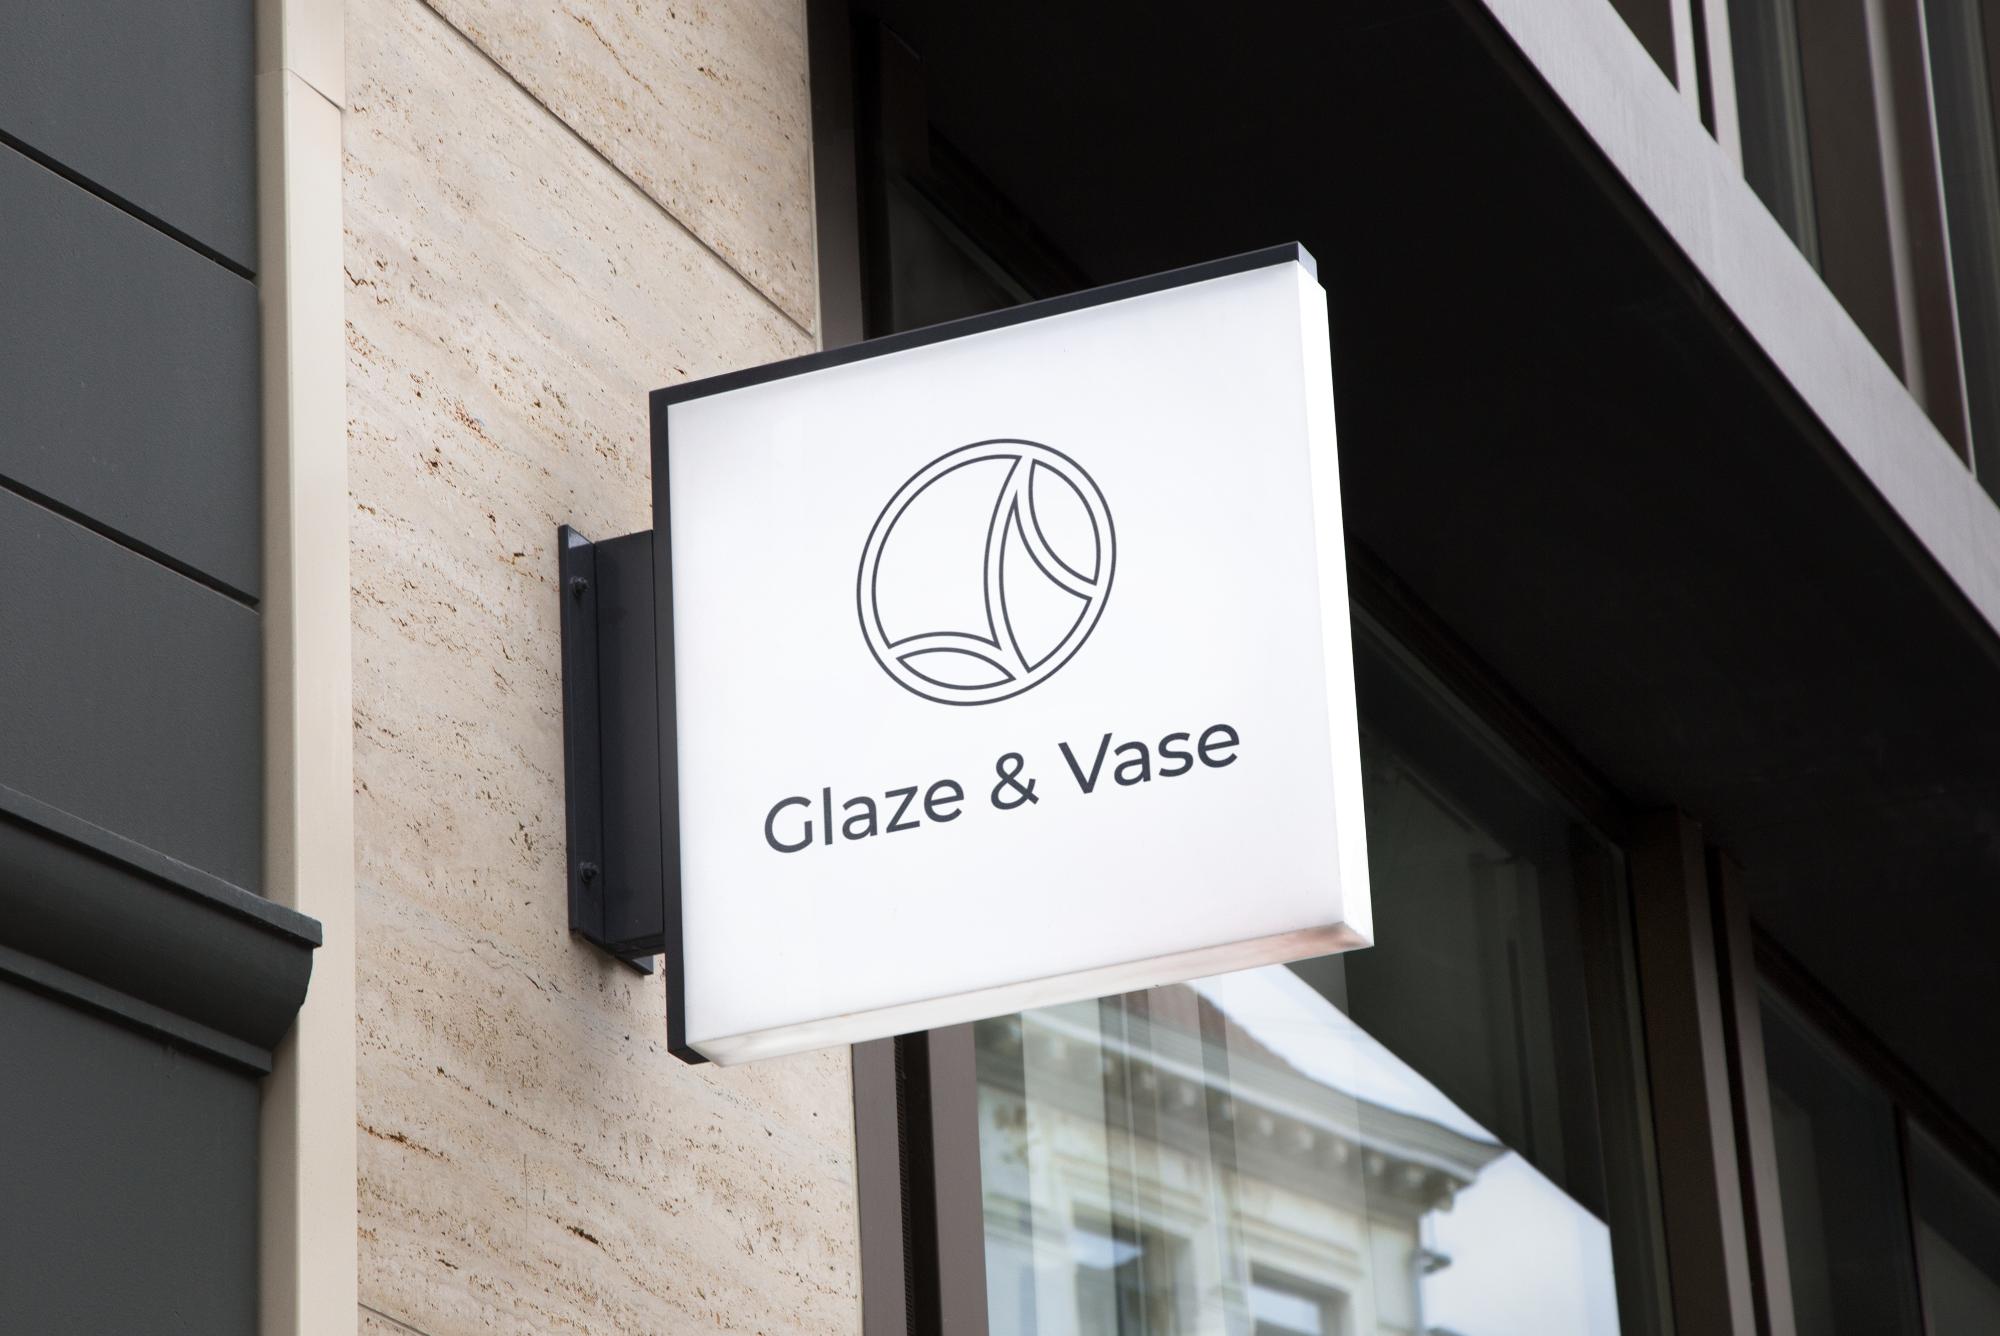 Glaze and Vase Brand Logo on a Sign